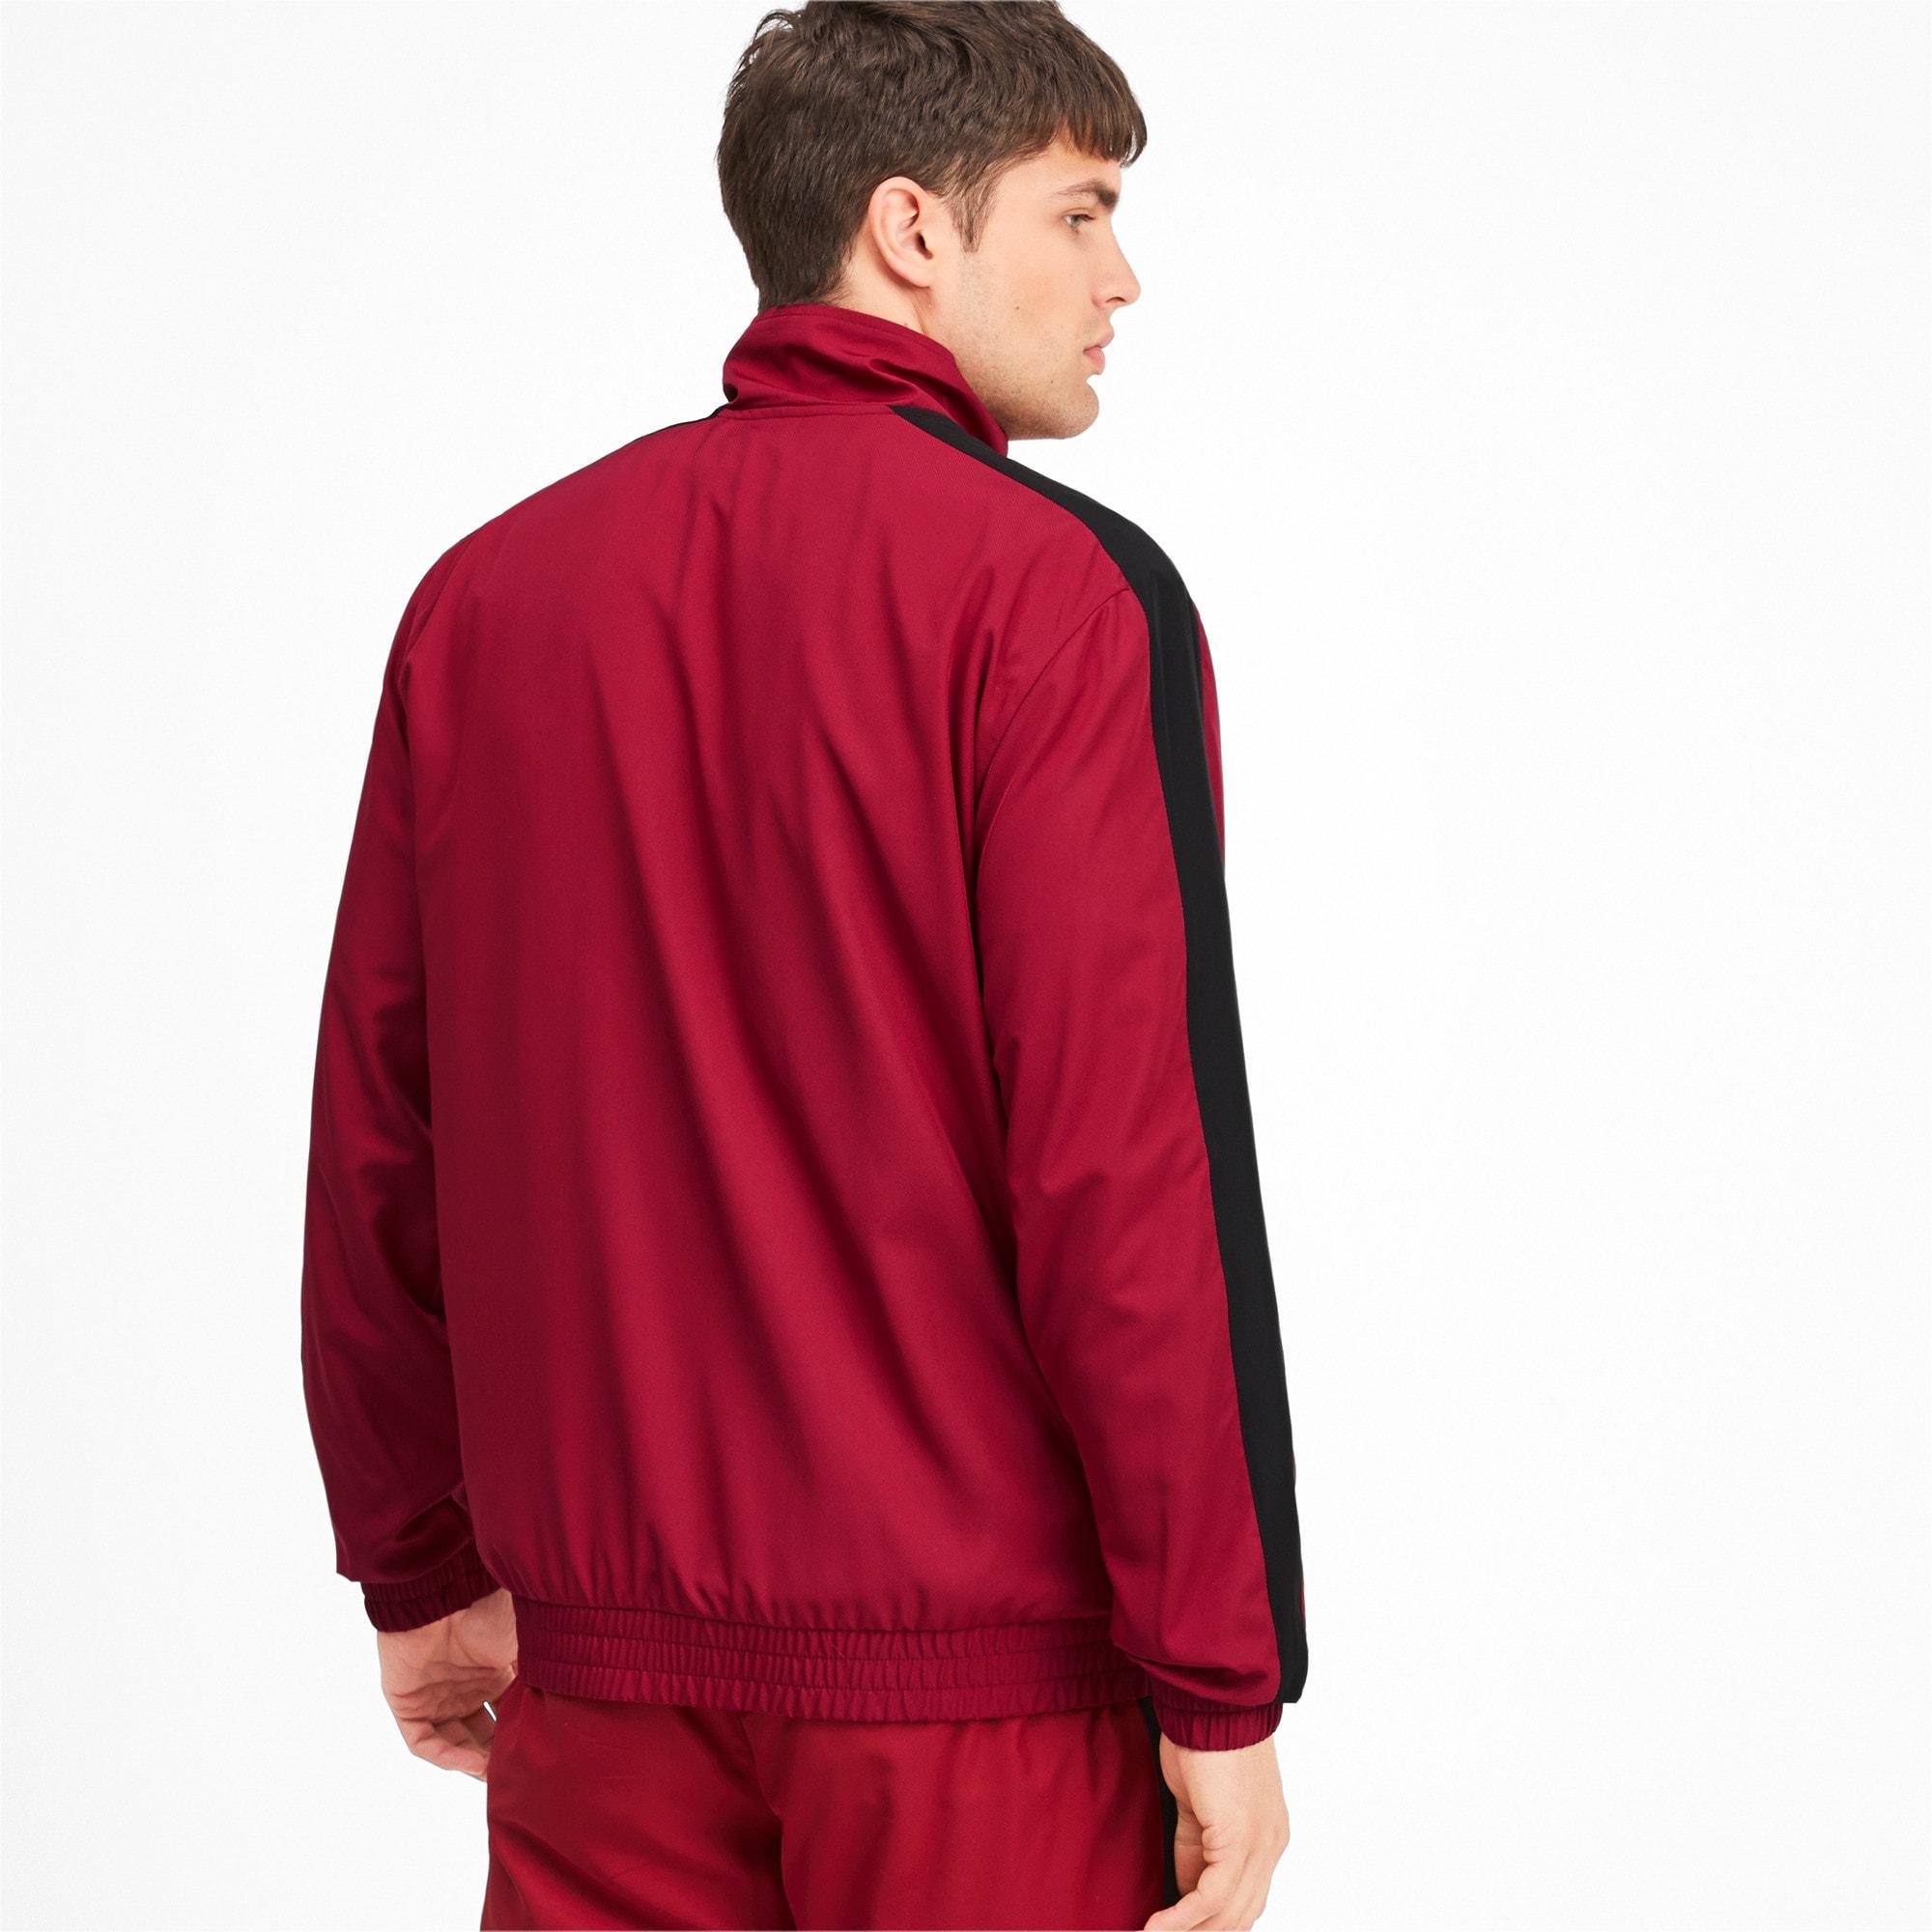 Thumbnail 2 of Iconic T7 Men's Woven Track Jacket, Rhubarb, medium